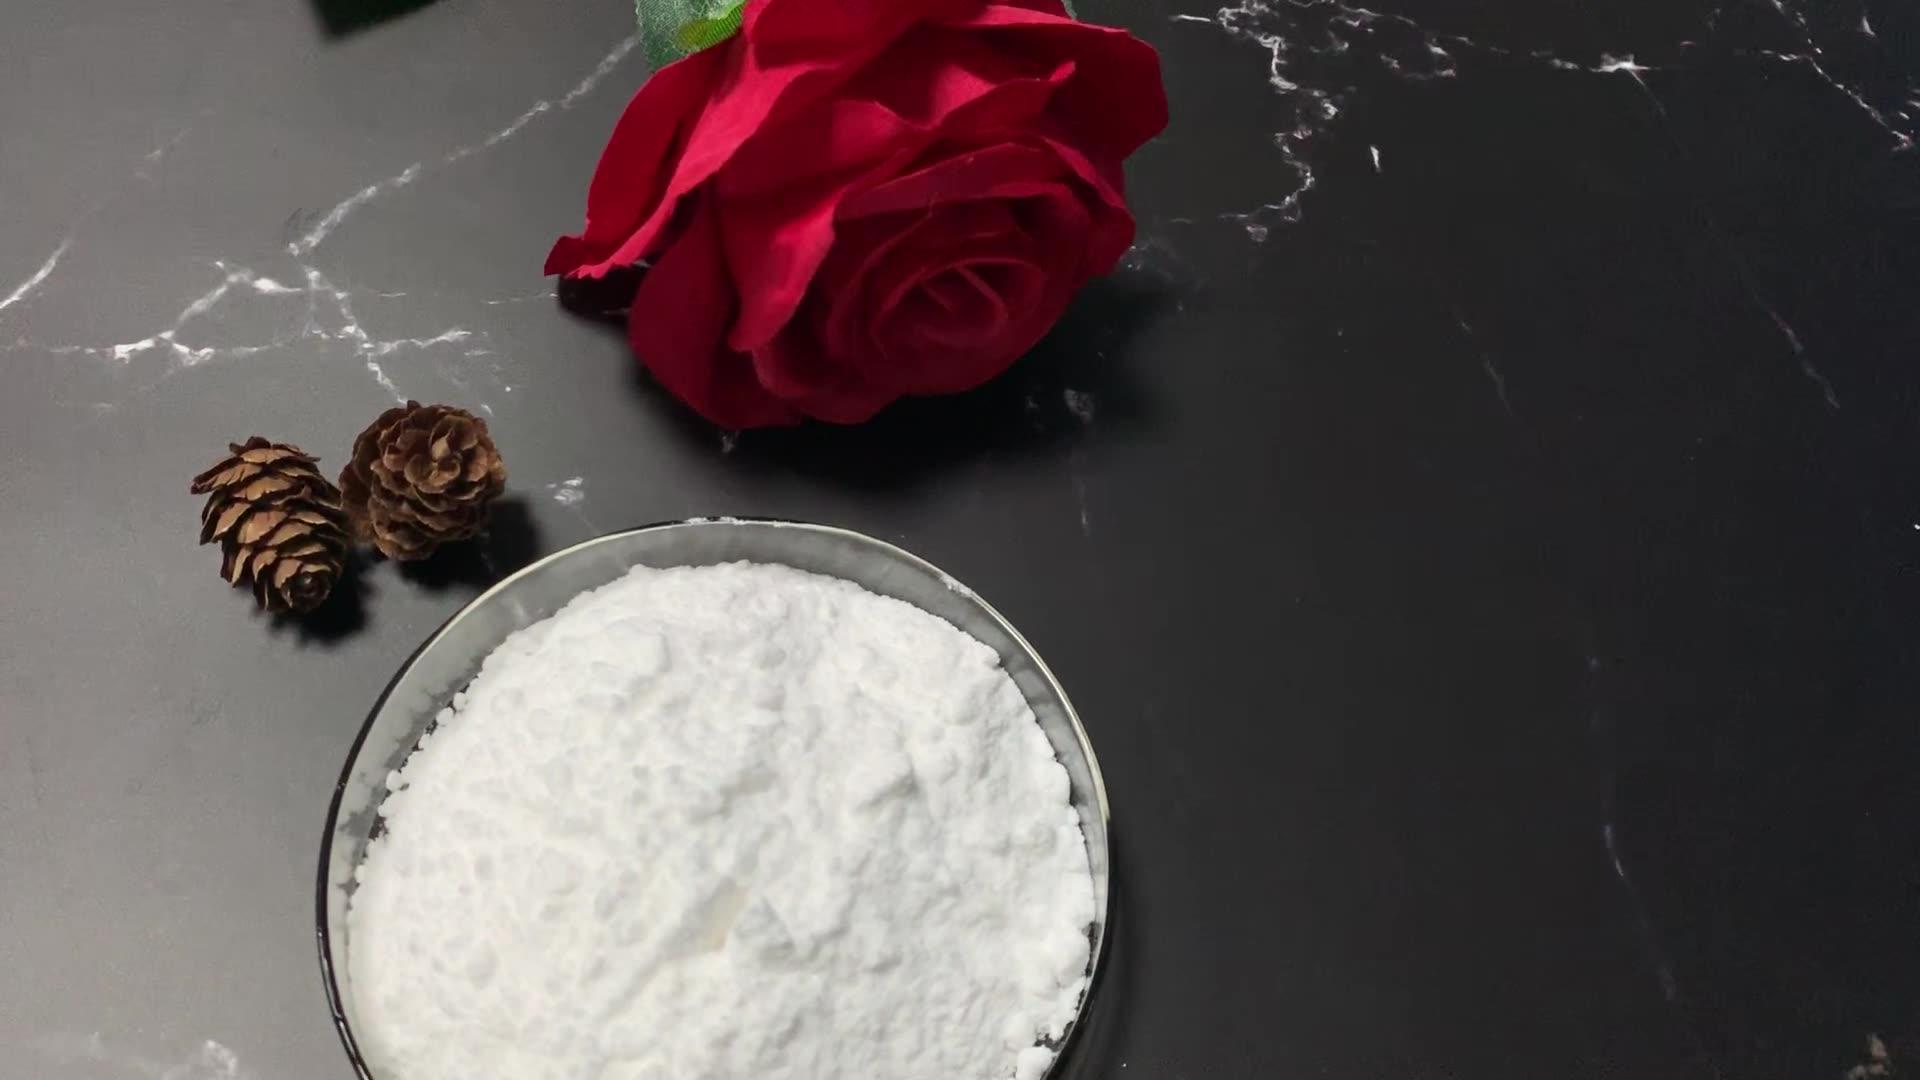 Stimulating hair and eyelash growth Cosmetic Peptide Myristoyl Tetrapeptide-12  CAS 959610-24-3